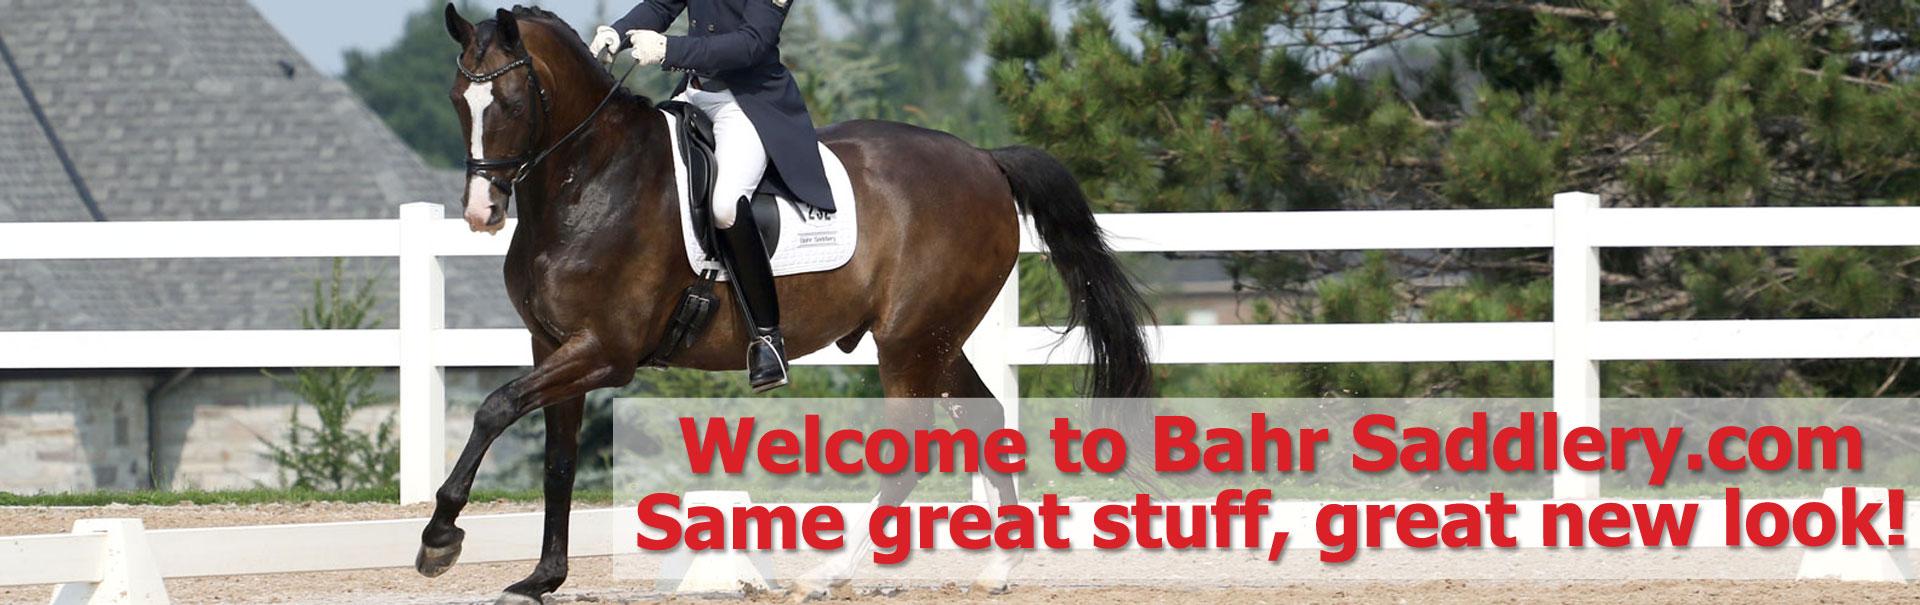 Bahr Saddlery.com